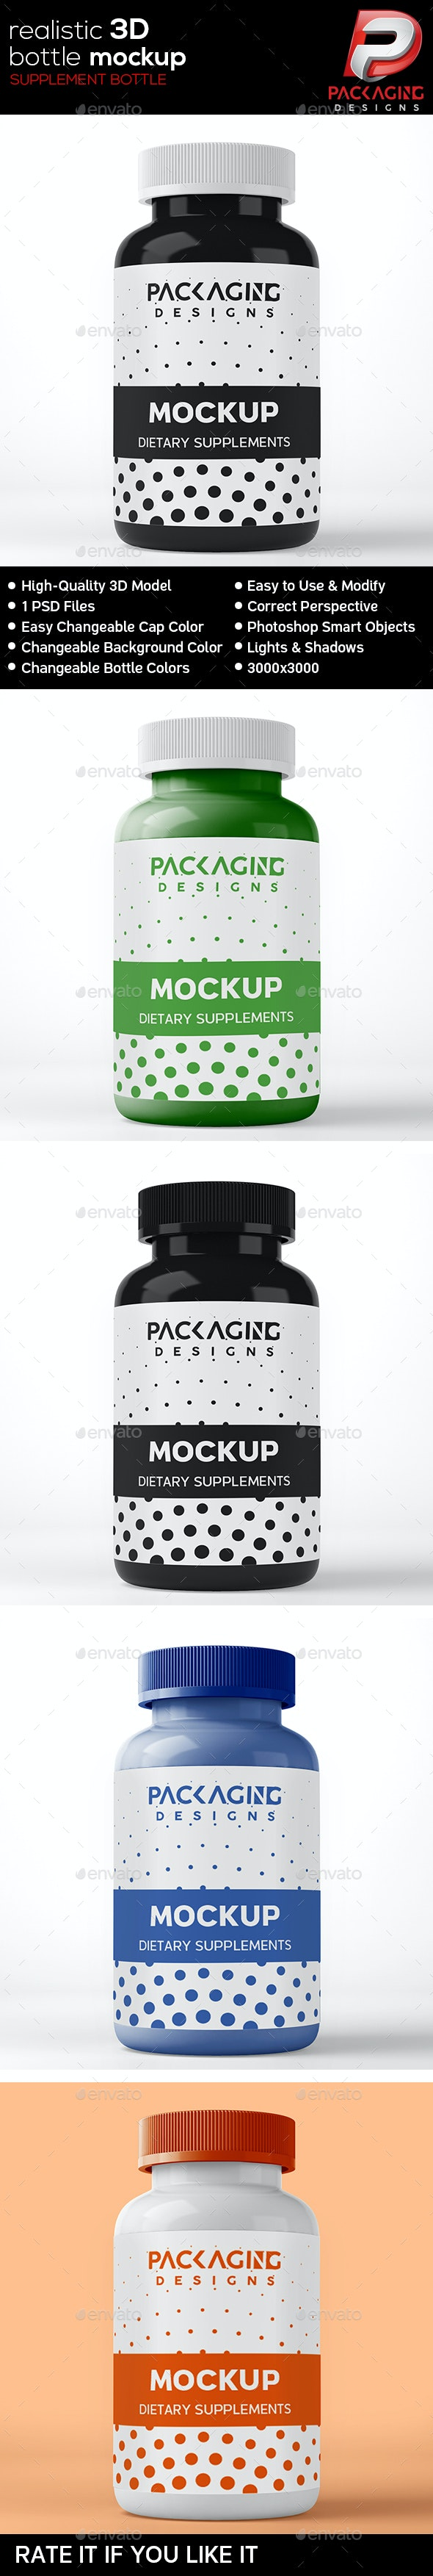 Realistic 3D Supplement Bottle Mock-Up-12 - Packaging Product Mock-Ups